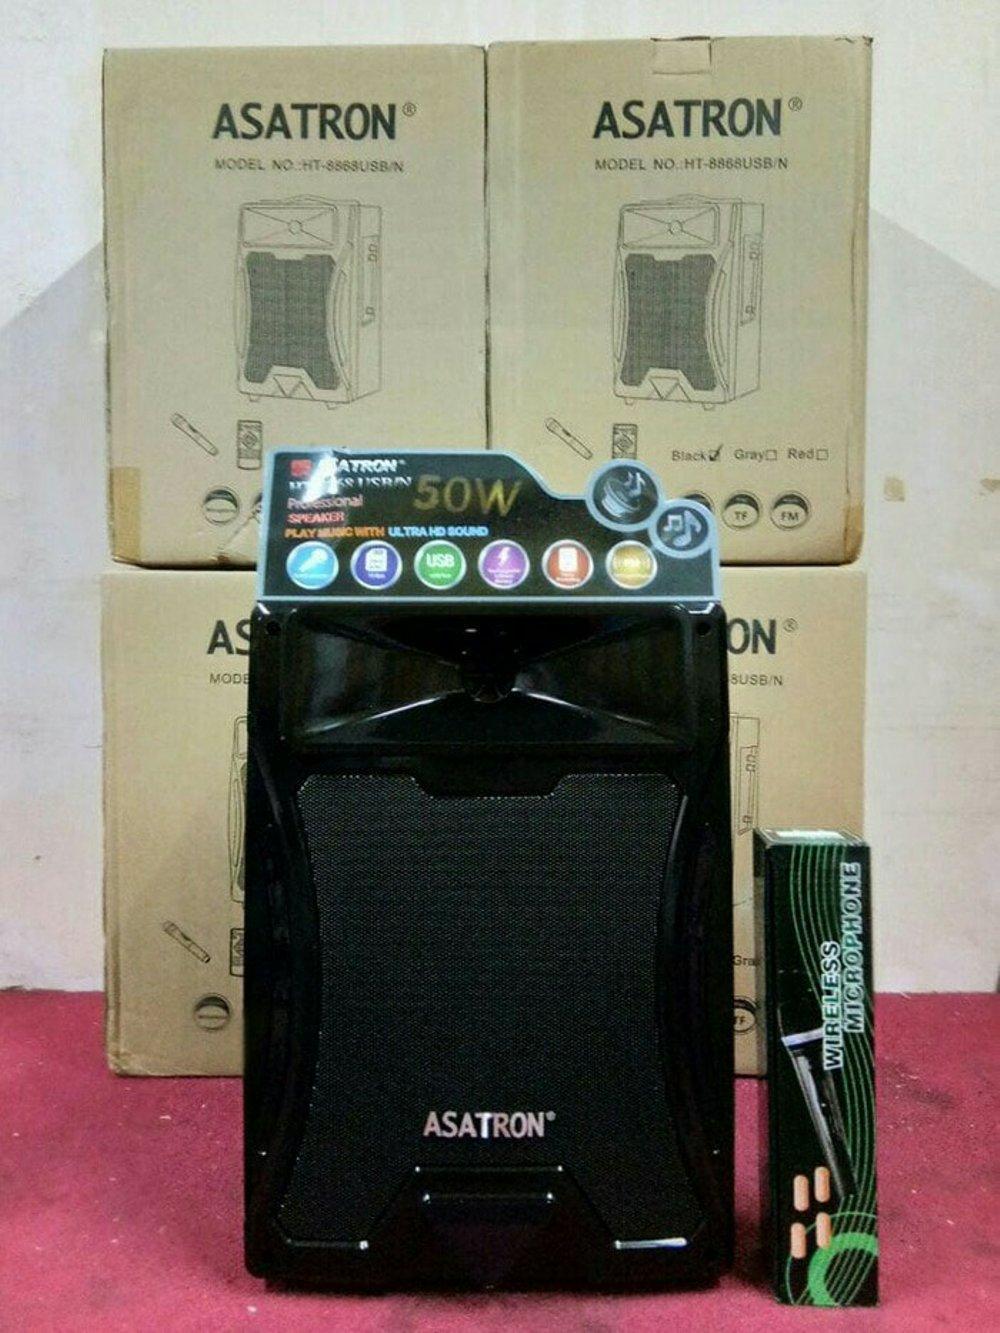 portabel speaker meeting asatron th8868 usb